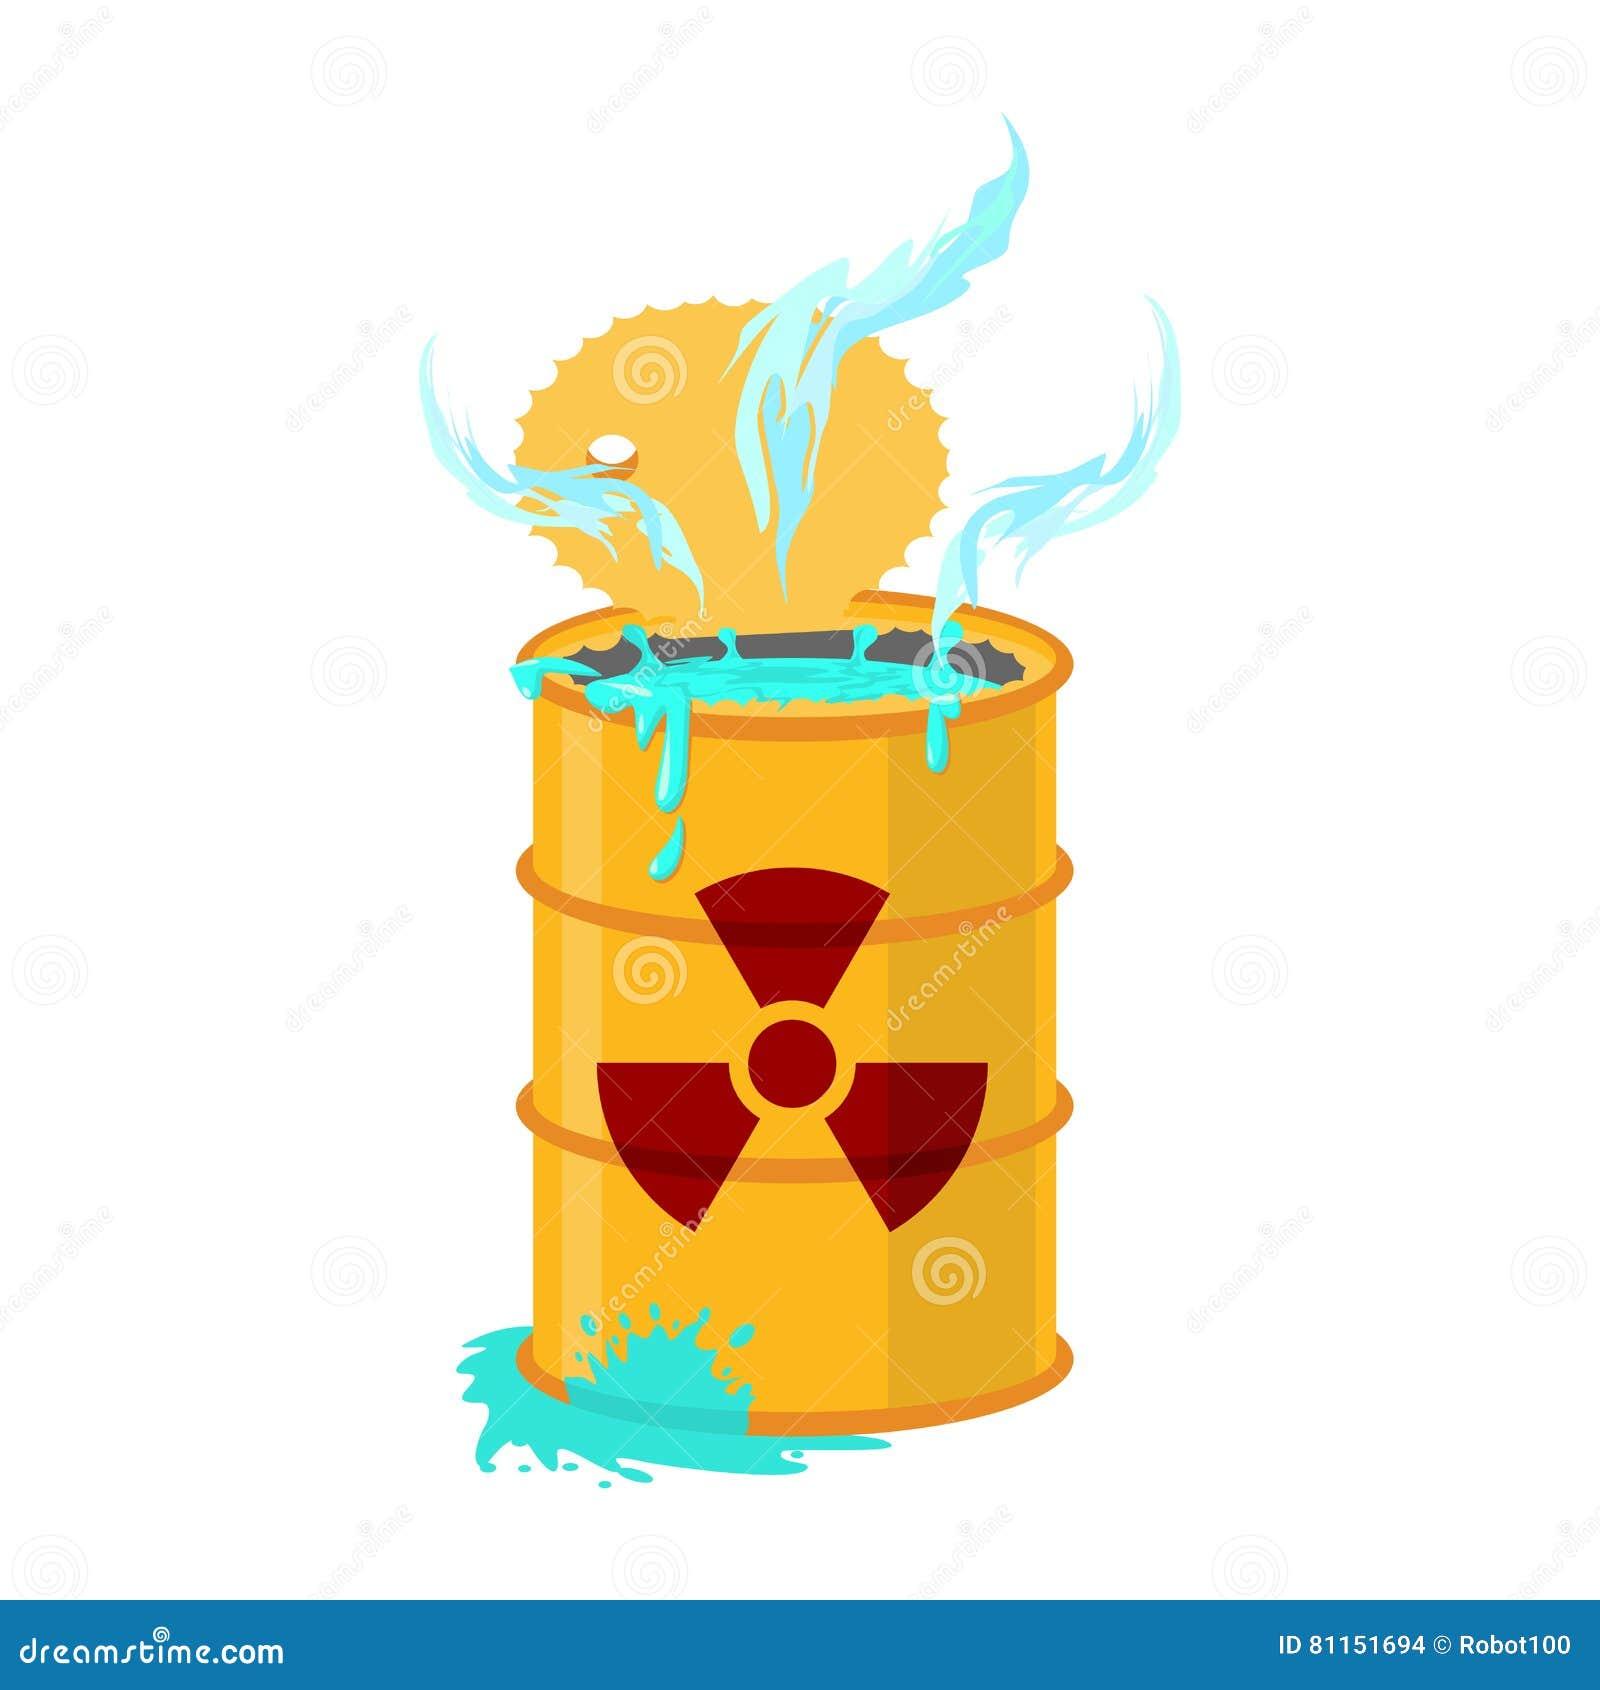 Chemisch afval geel vat Giftig afvalvaatje Giftige vloeistof